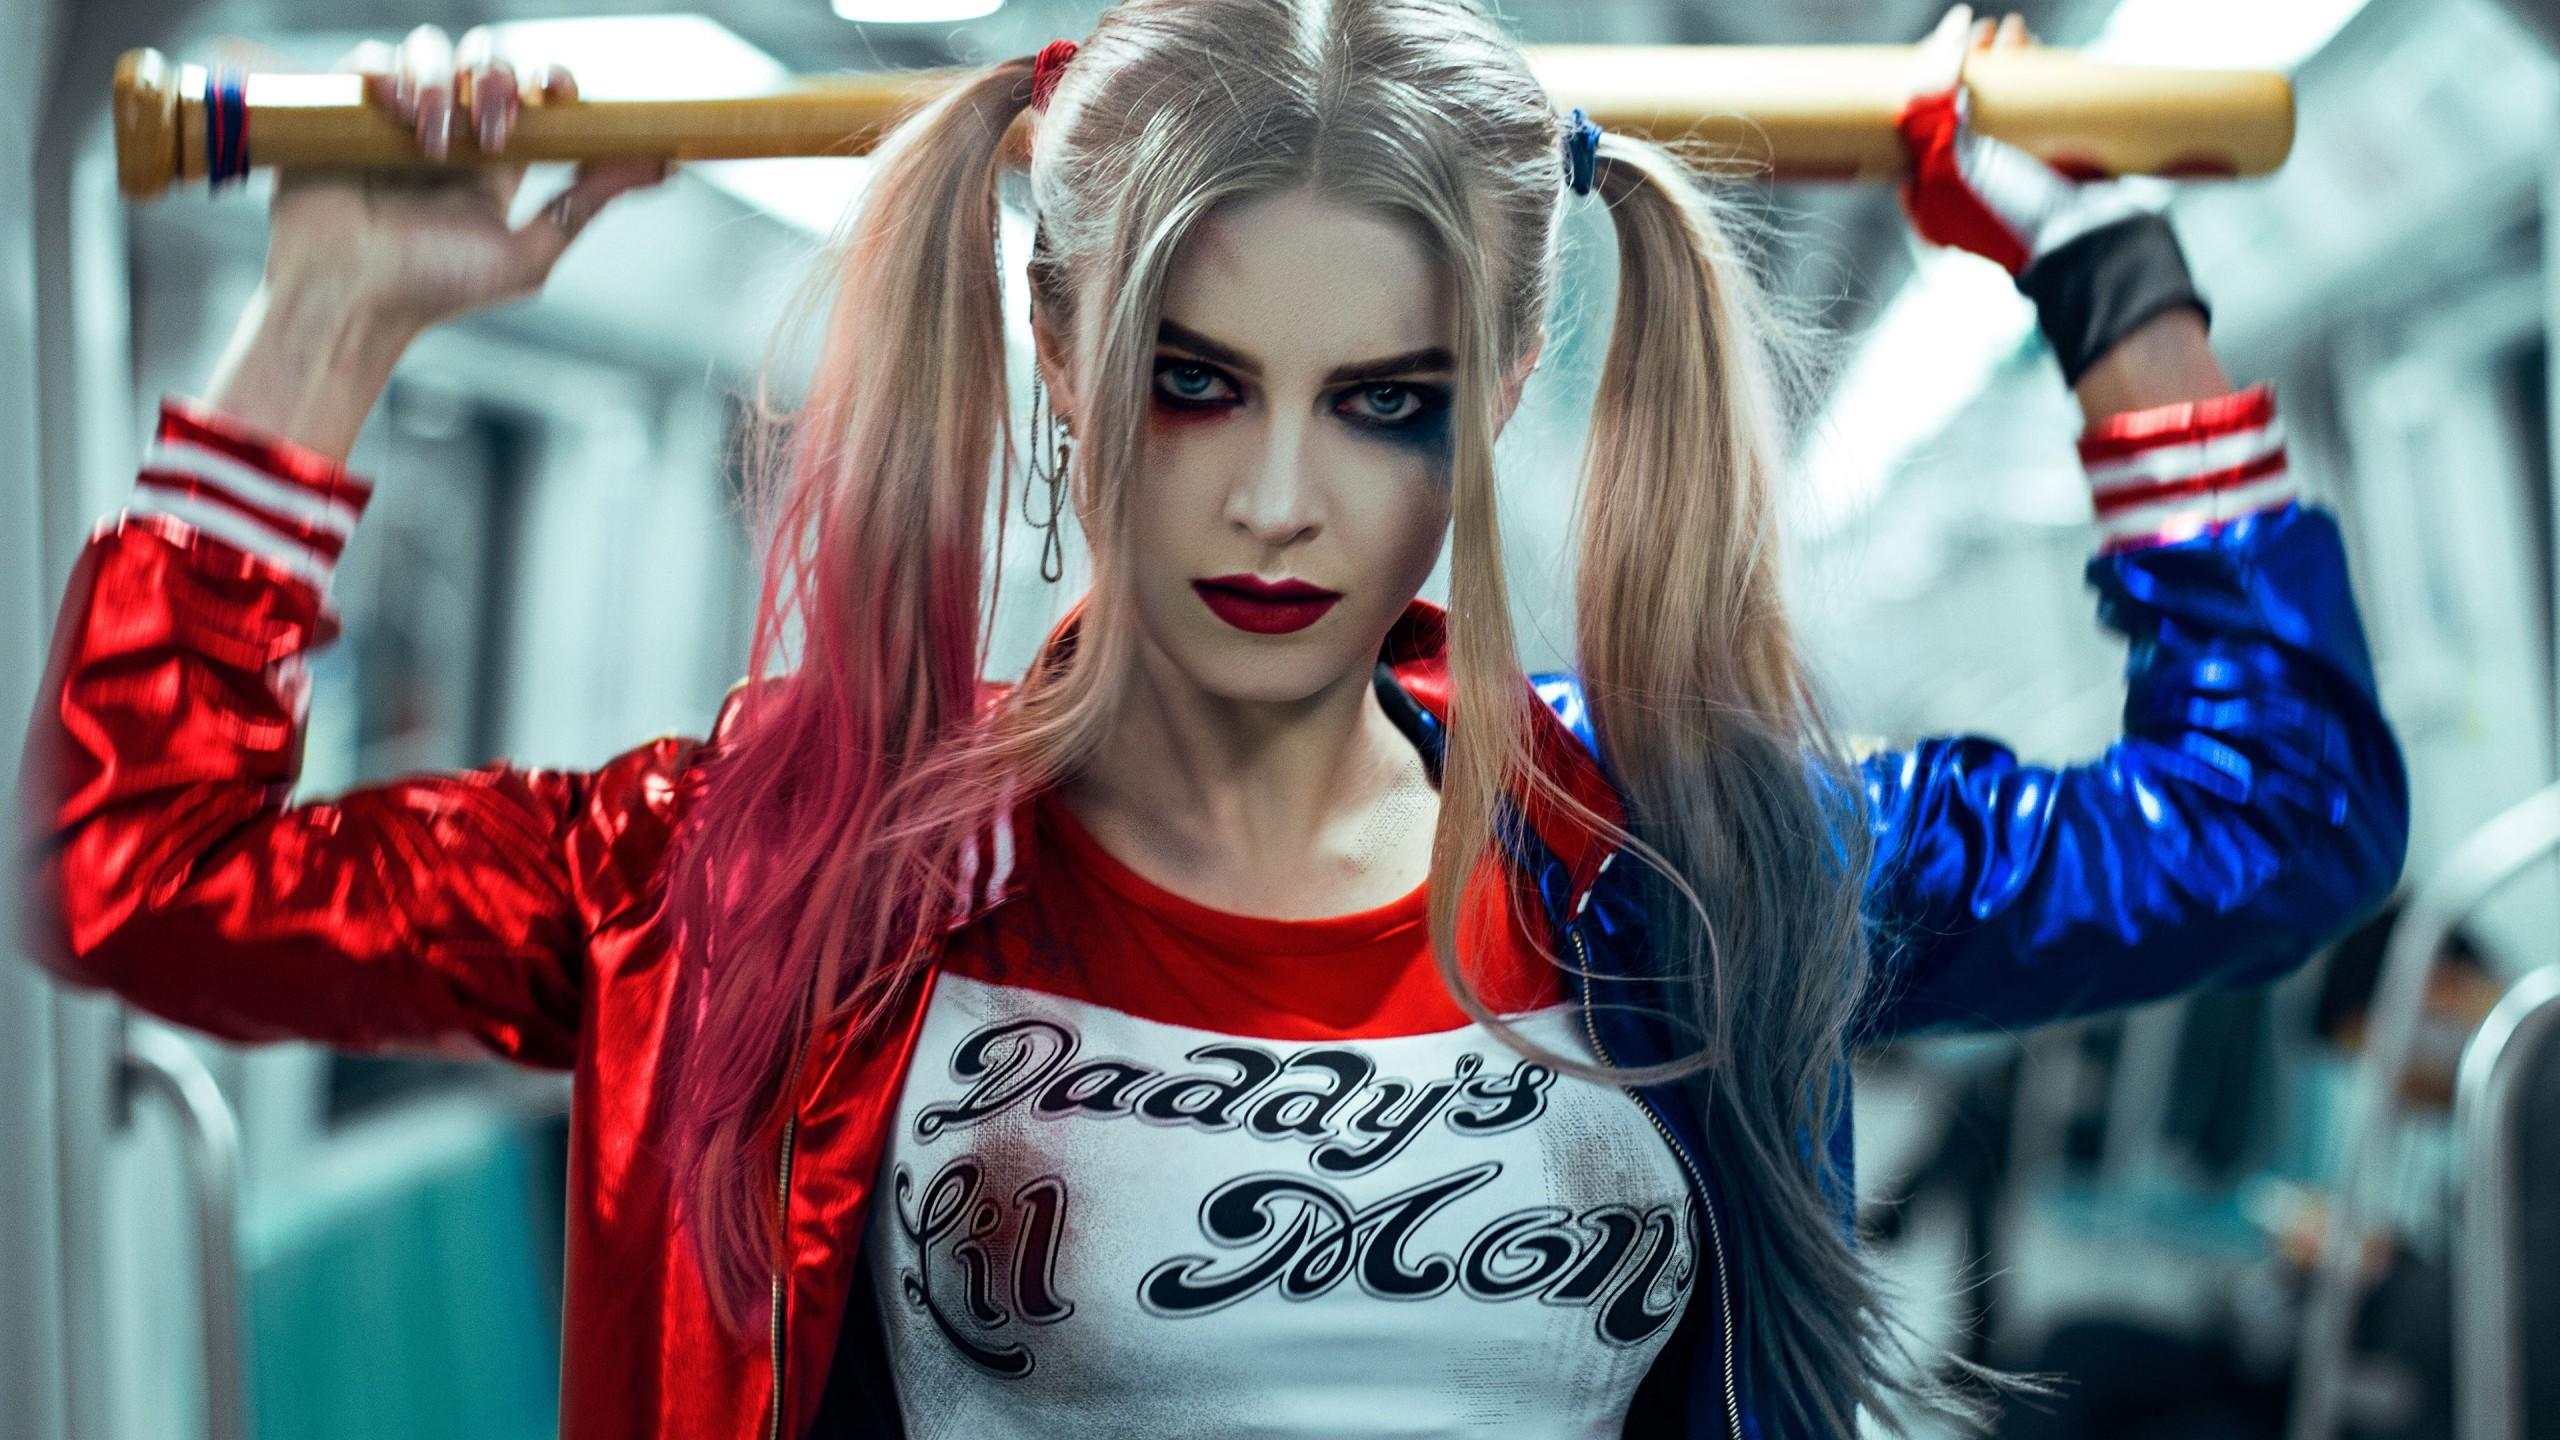 Movies / Harley Quinn Wallpaper